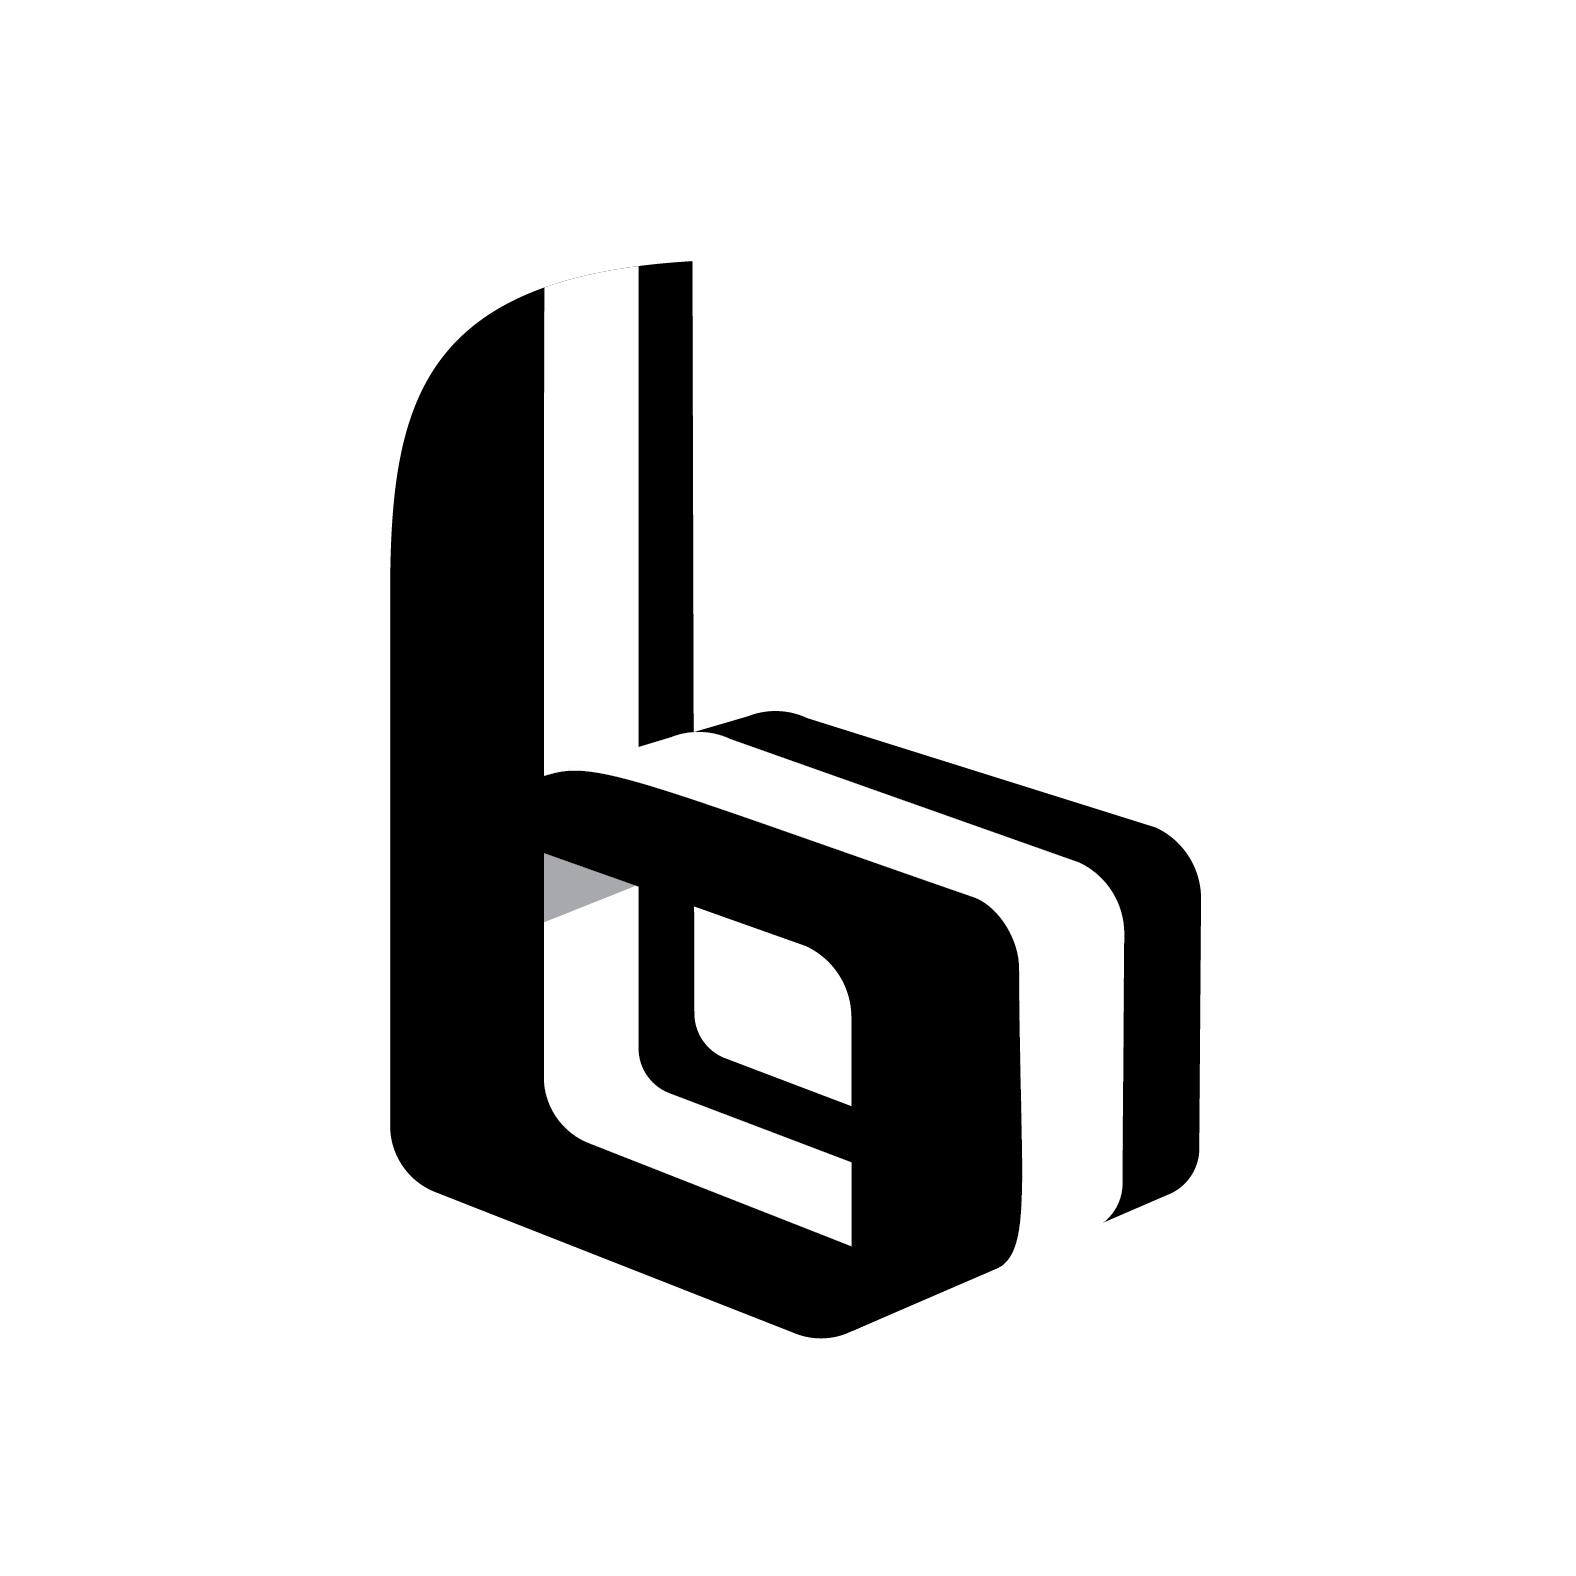 Bonum - Design, Printing & Packaging